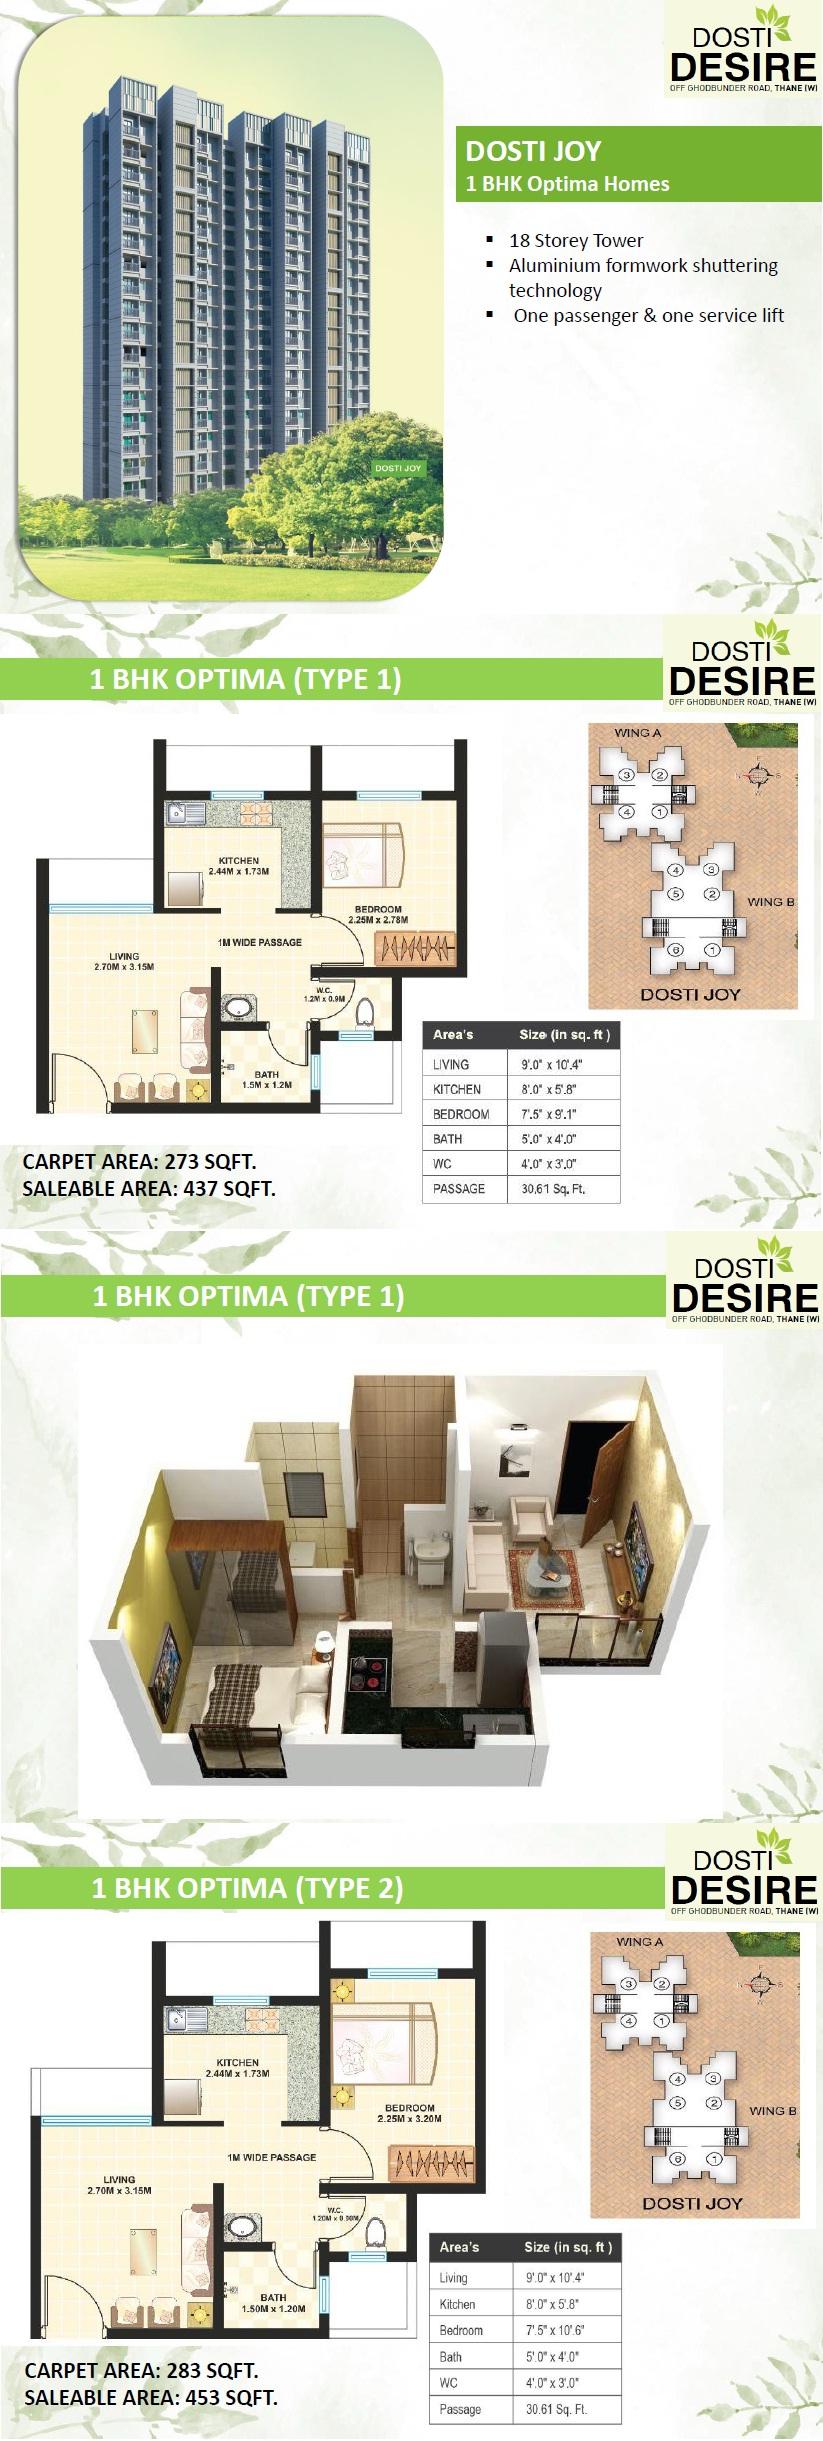 Dosti Desire Thane Mumbai